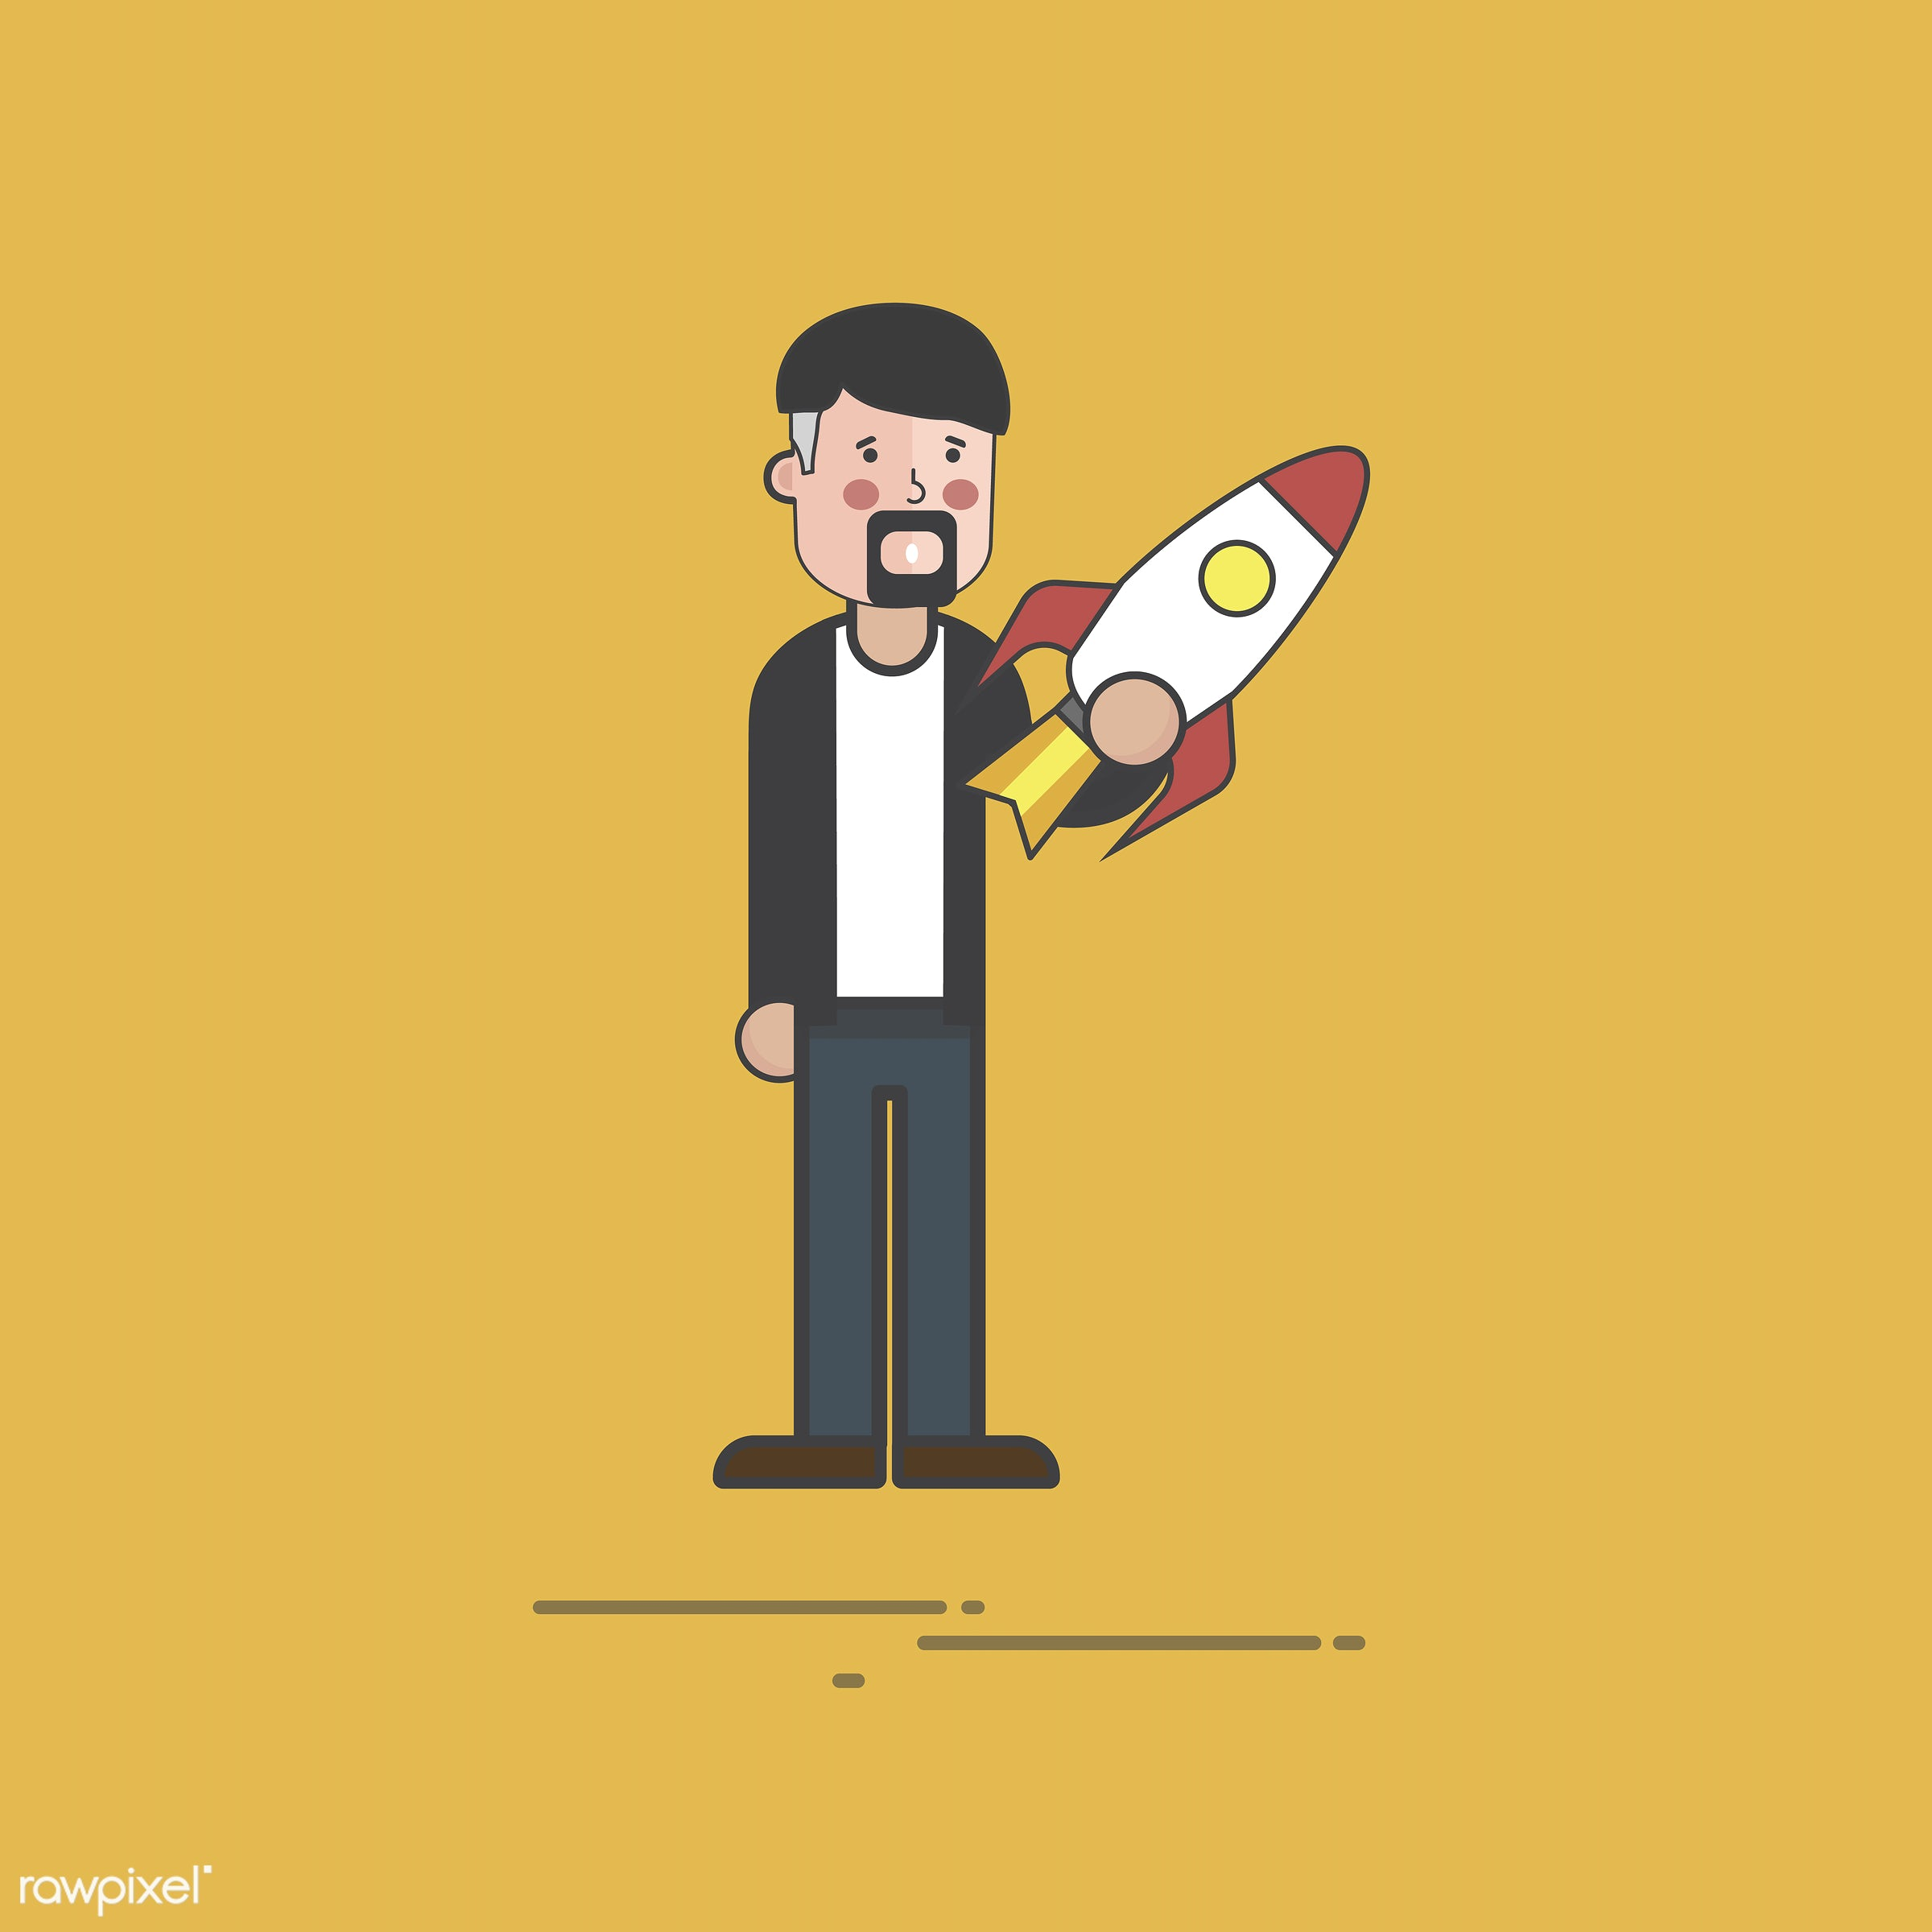 Illustration of people avatar - aim, avatar, business, cartoon, character, drawing, flat, graphic, icon, illustration,...